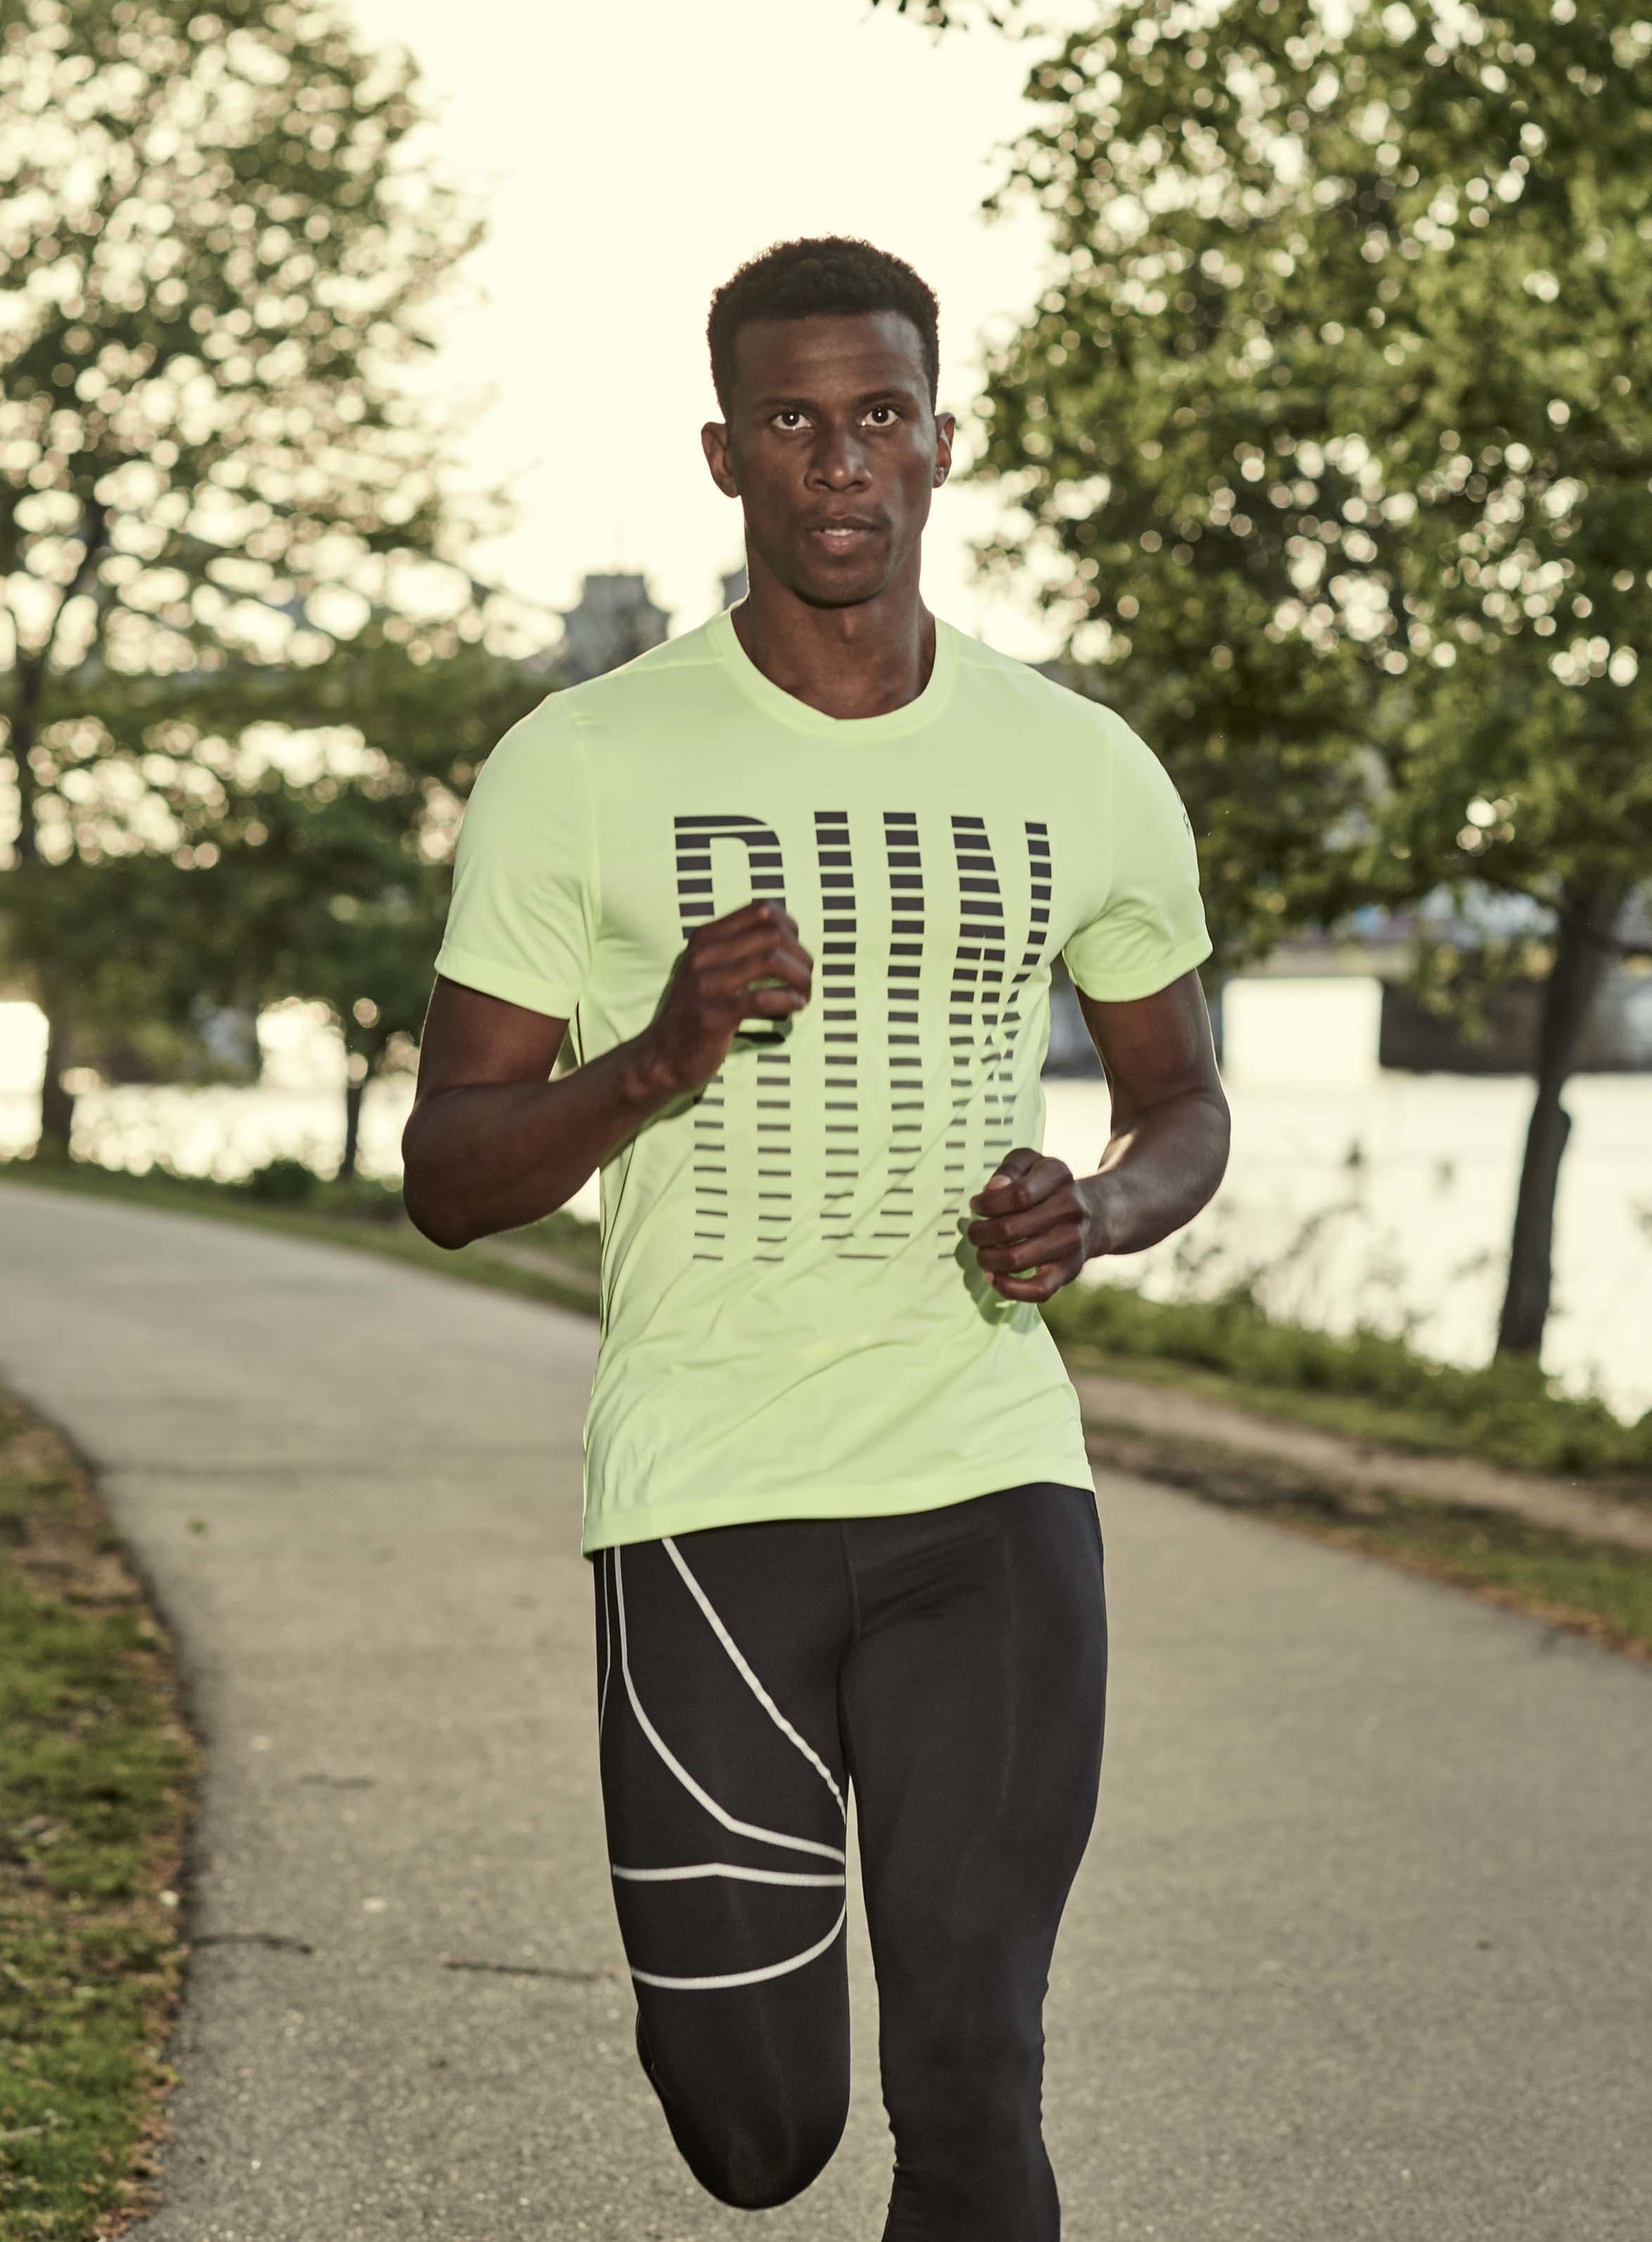 running-marathon-inspiration-1